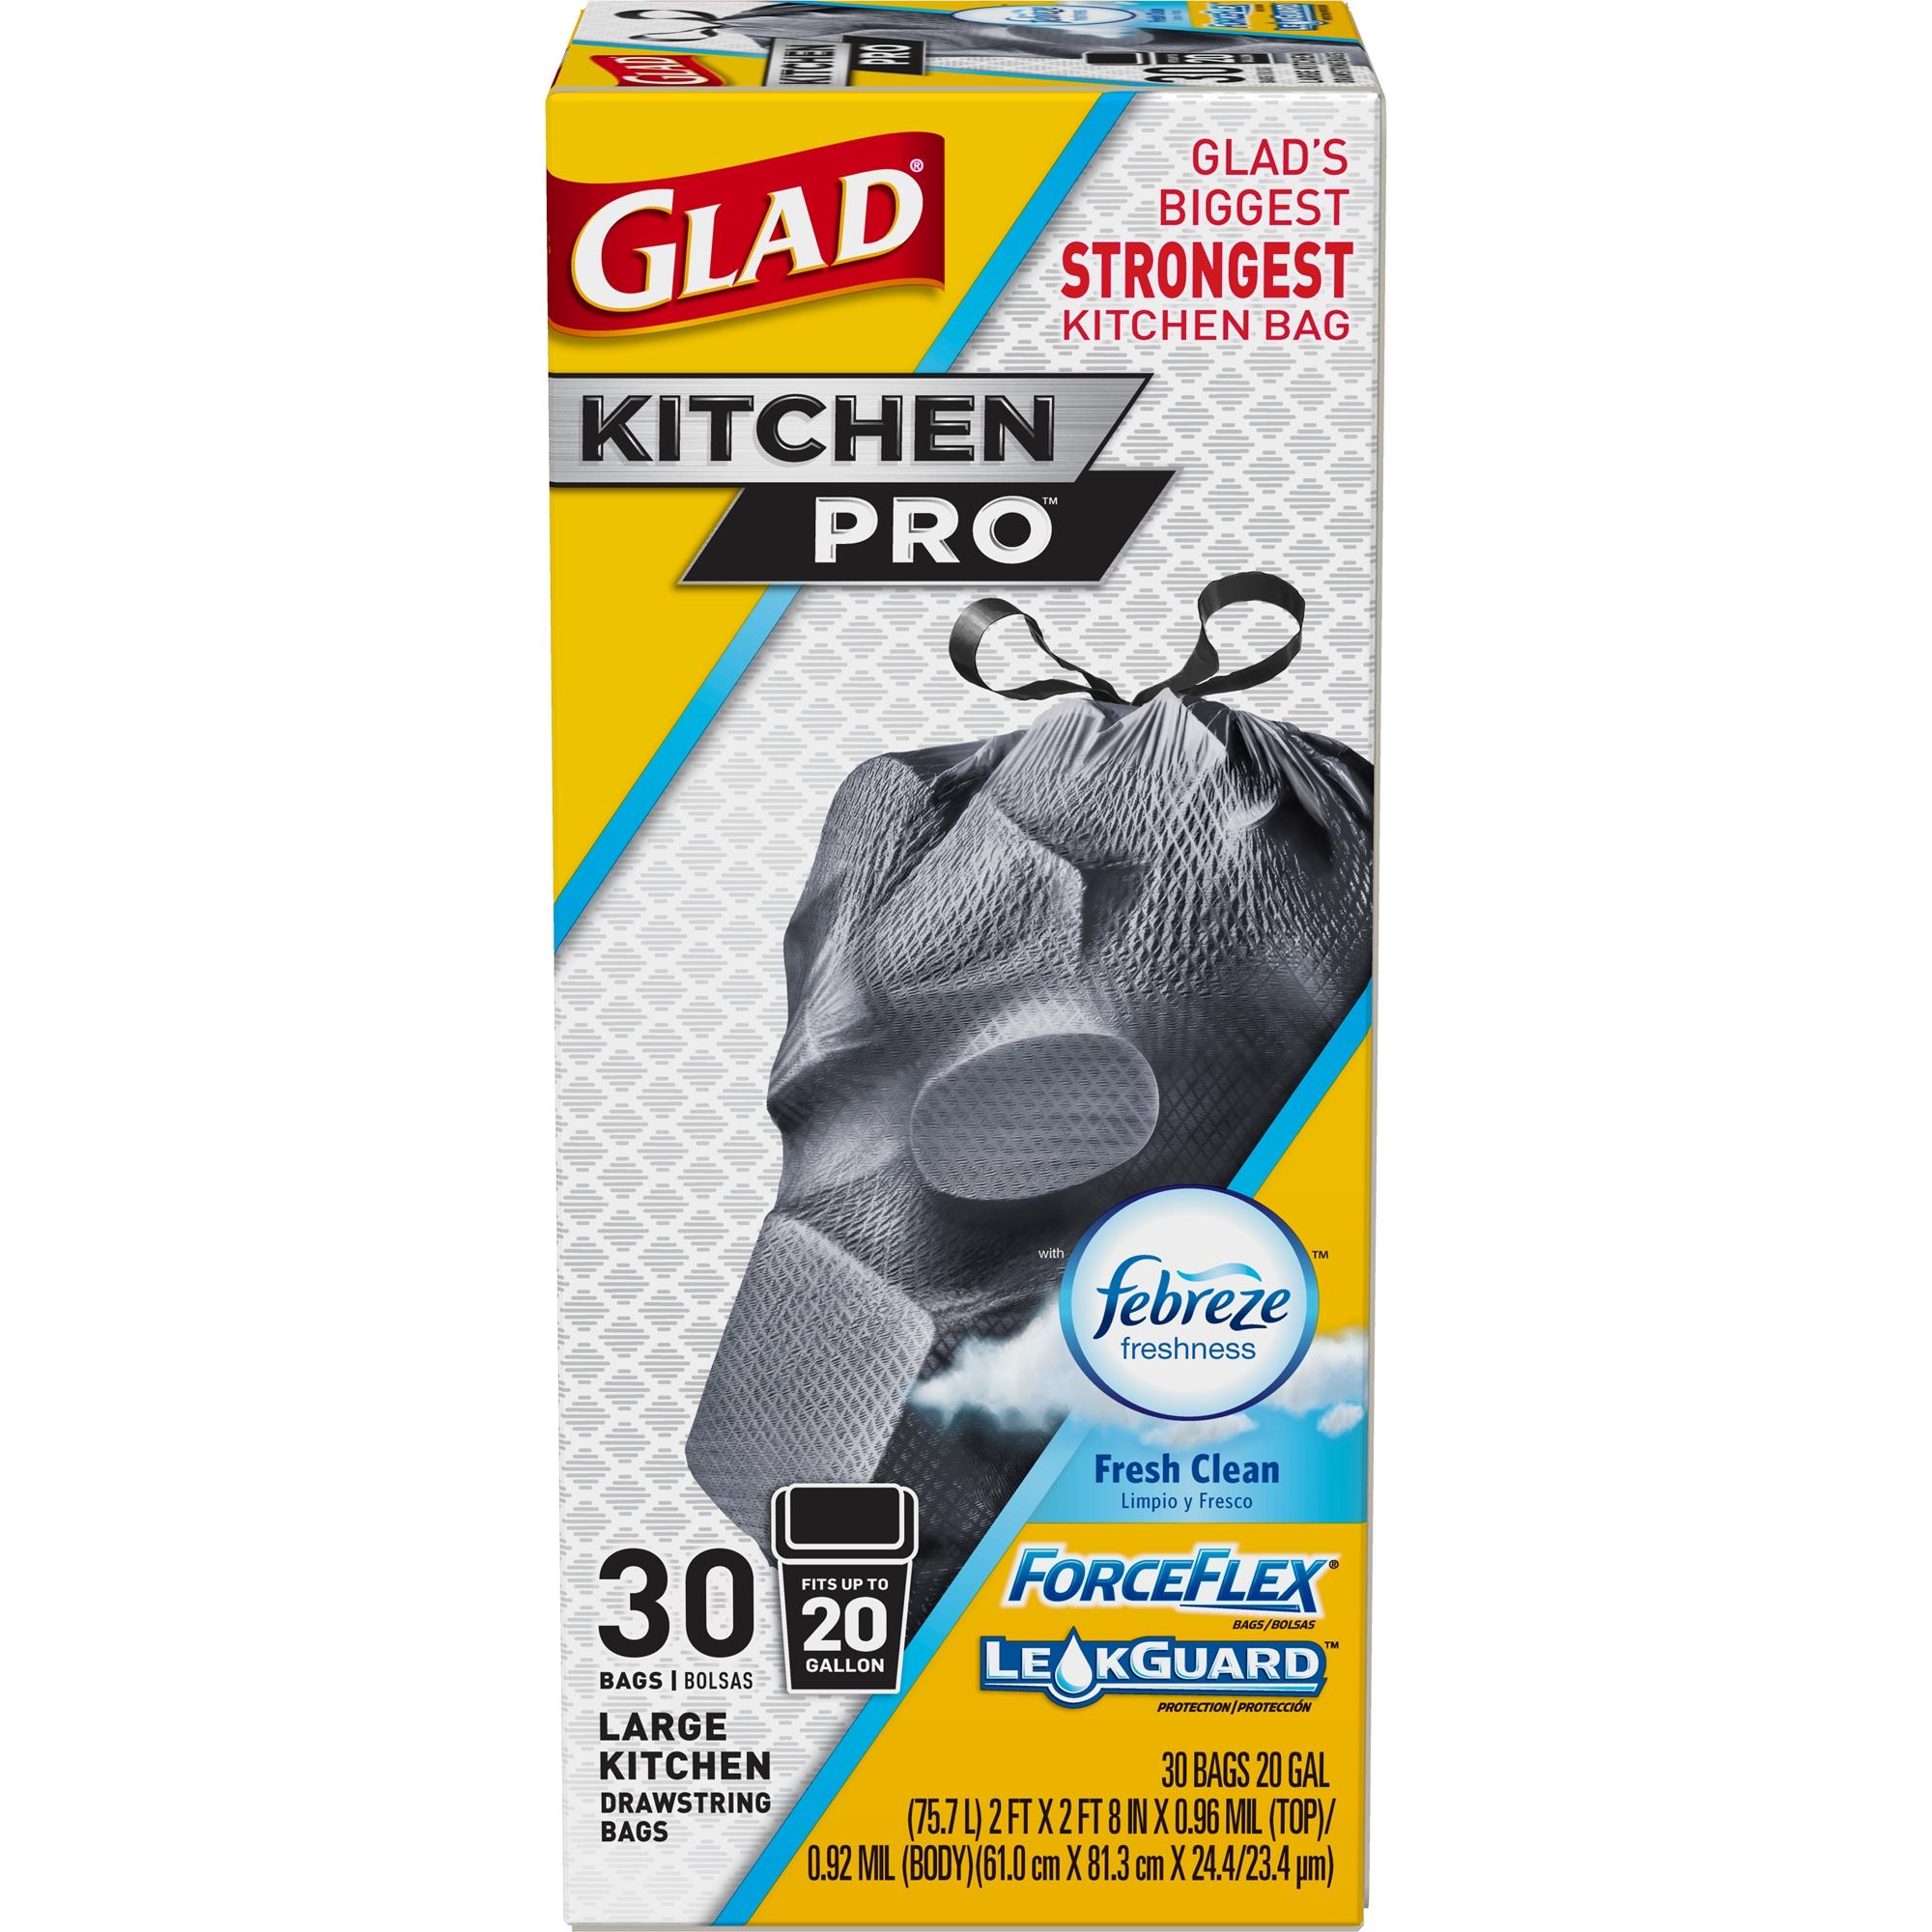 Glad Forceflex Kitchen Pro Drawstring Trash Bags - Febreze Fresh Clean - 20 Gallon - 30 ct